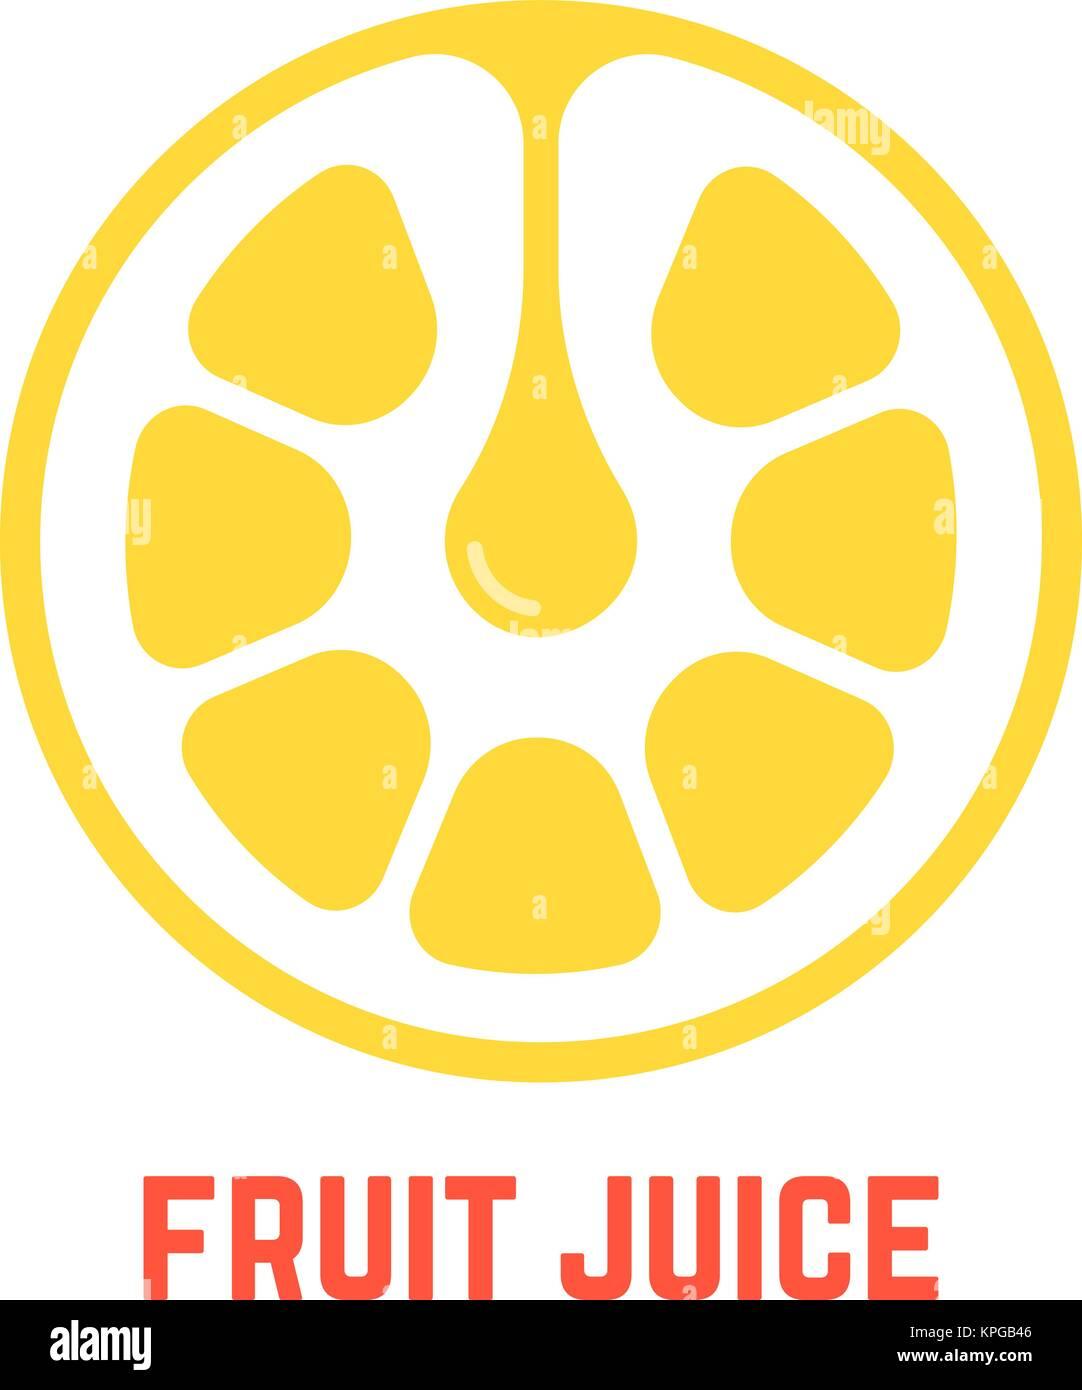 simple yellow fruit juice logo Stock Vector Art